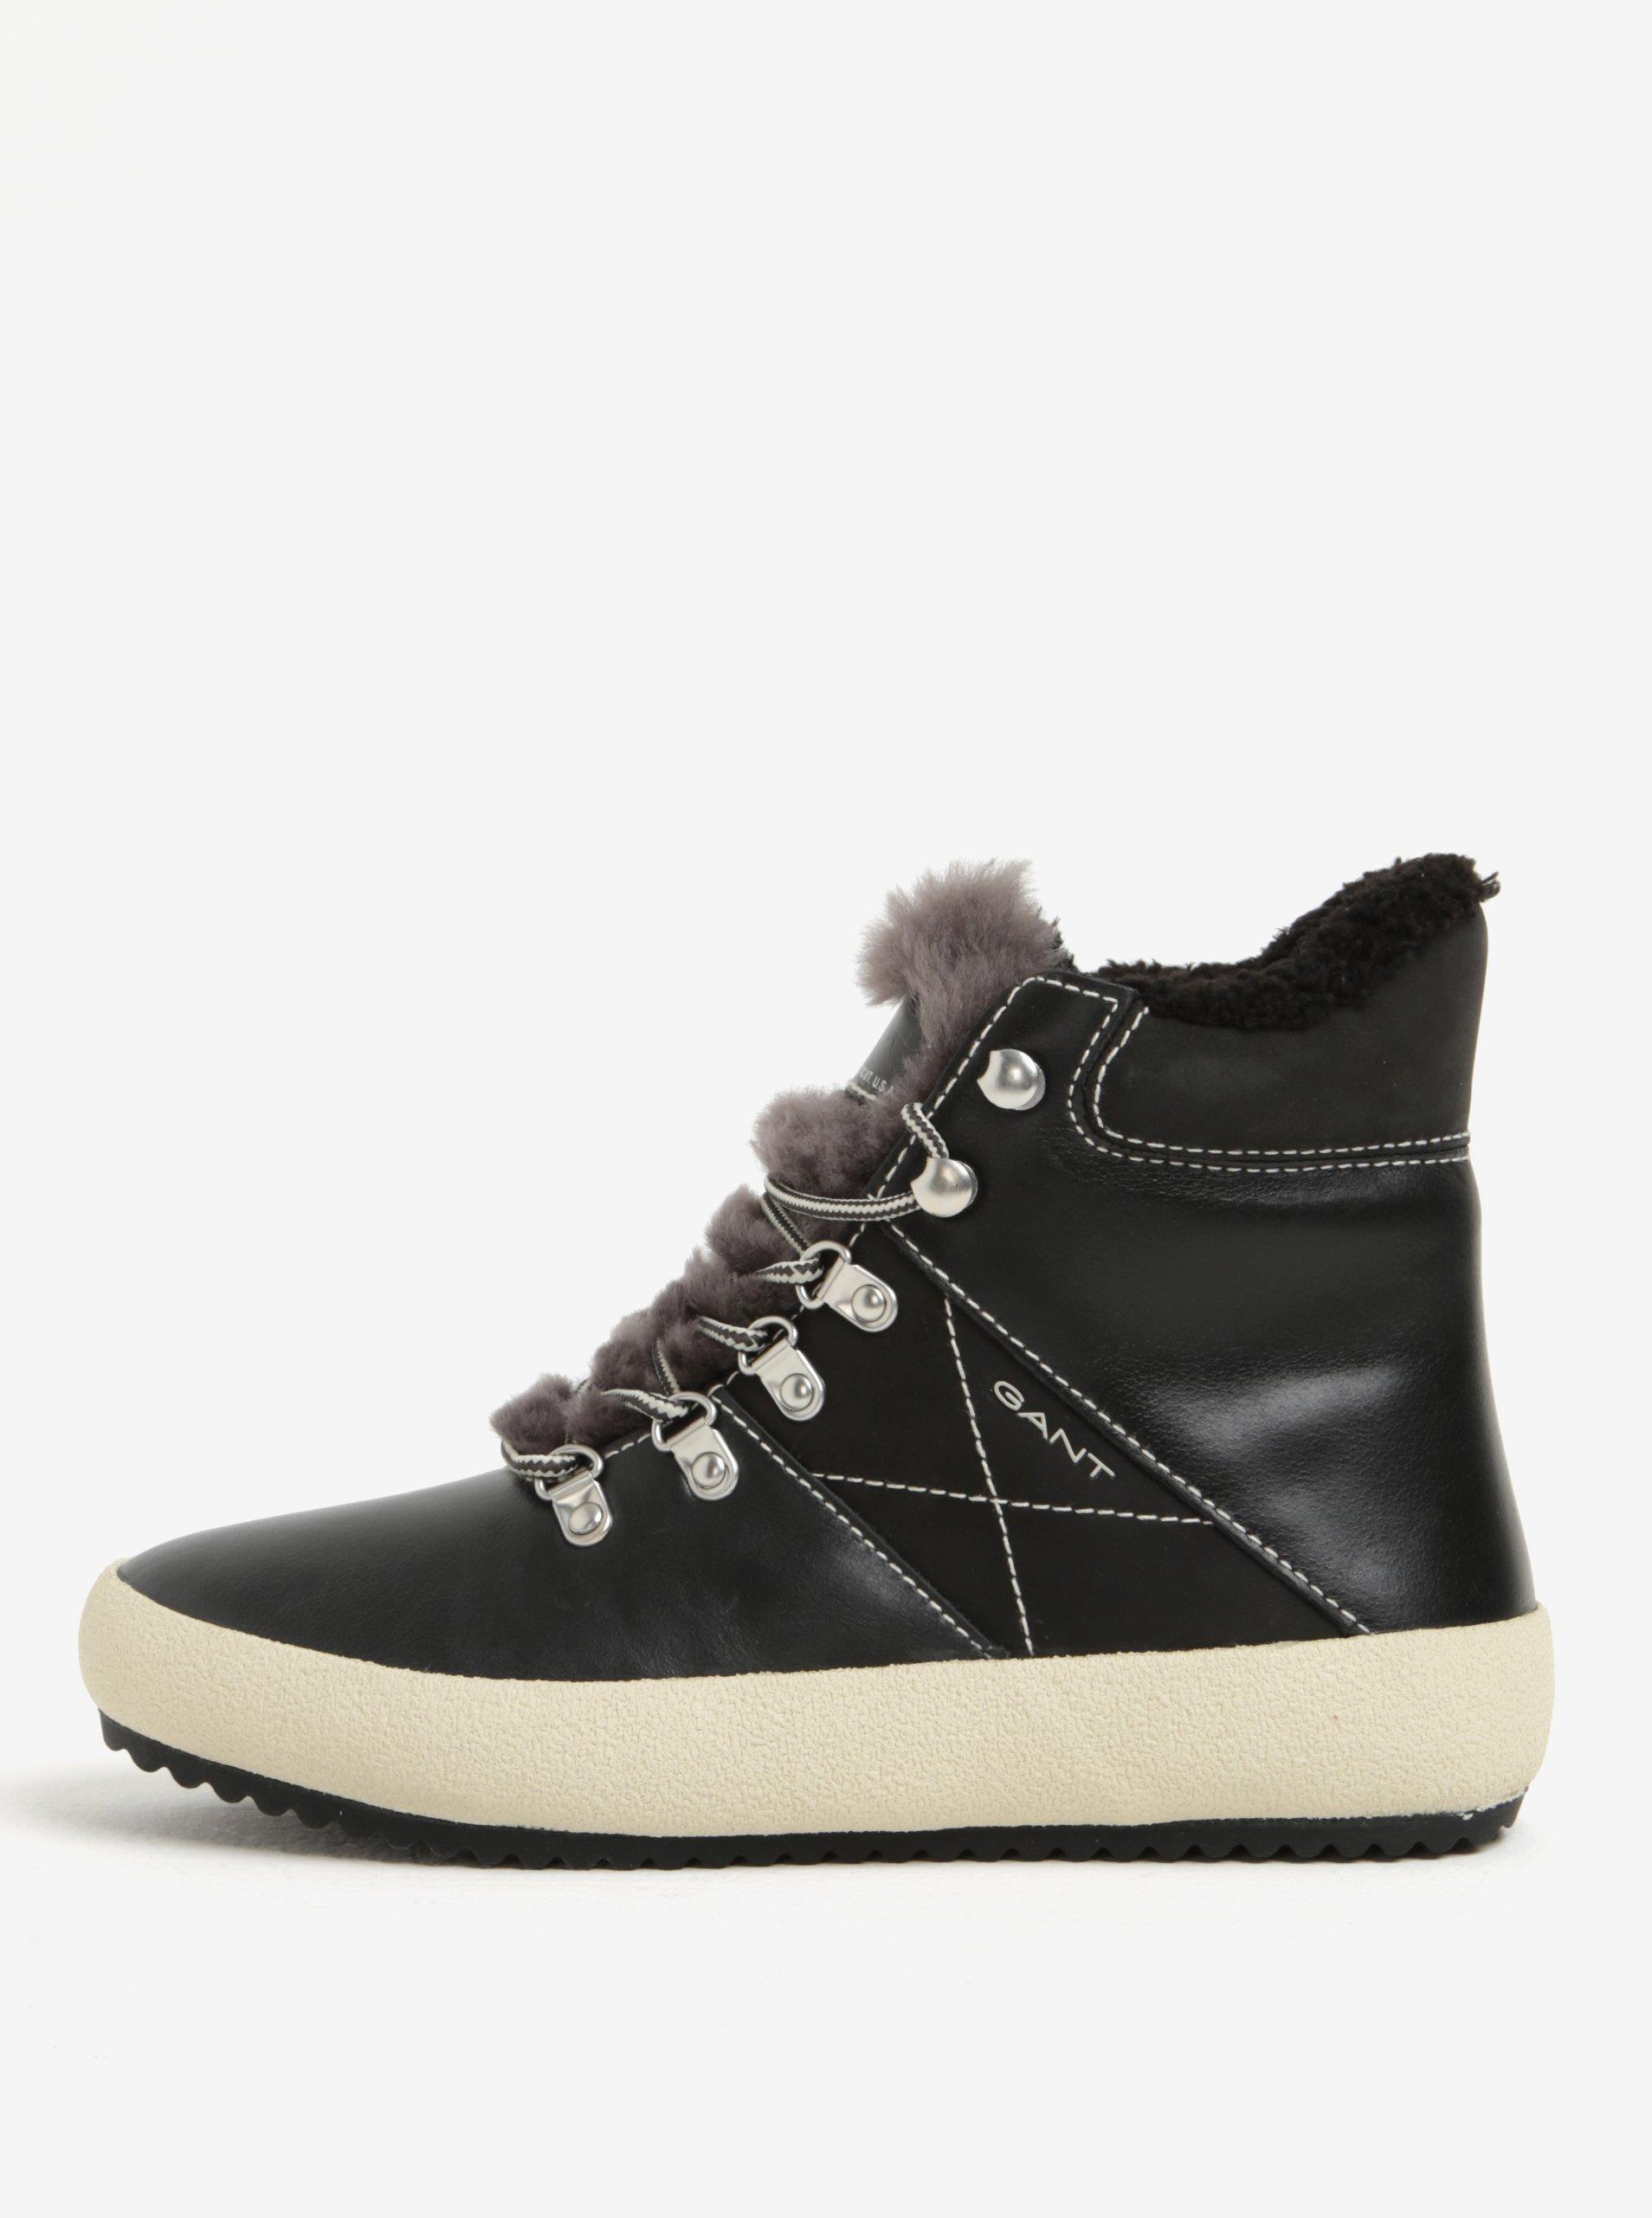 4fa39727ee45 Čierne dámske kožené zateplené členkové topánky GANT Amy